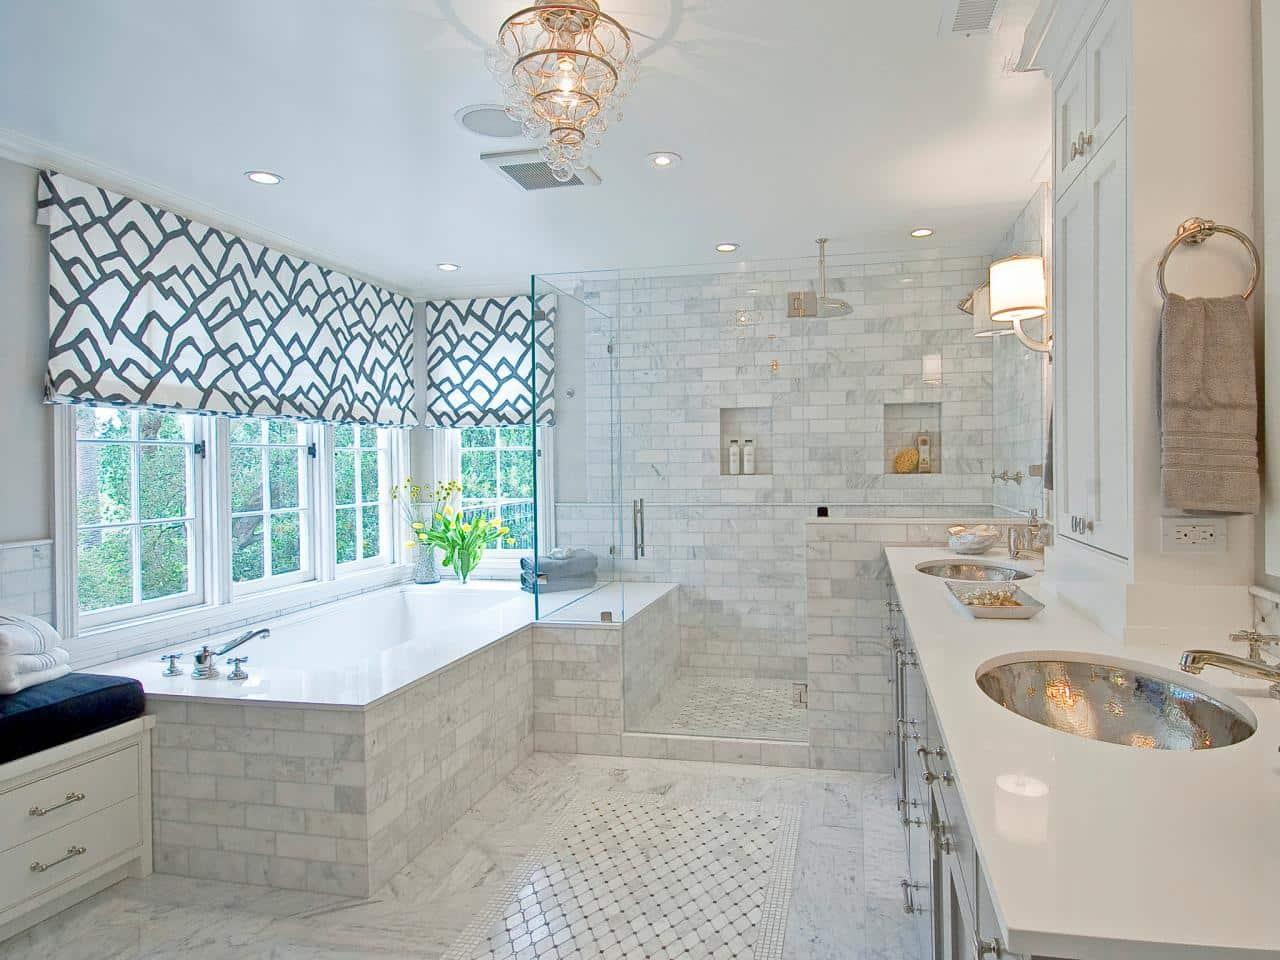 Bathroom with windows white